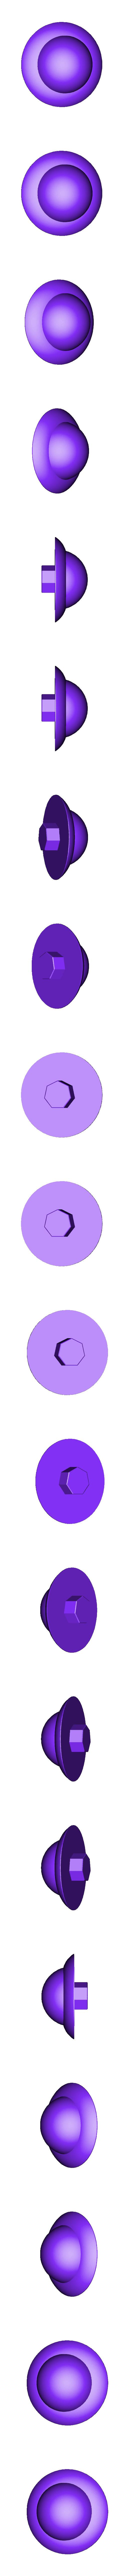 Caterpillar_TAIL_2.0.stl Download STL file Shape Shaker_Caterpillar • Design to 3D print, Ocrobus